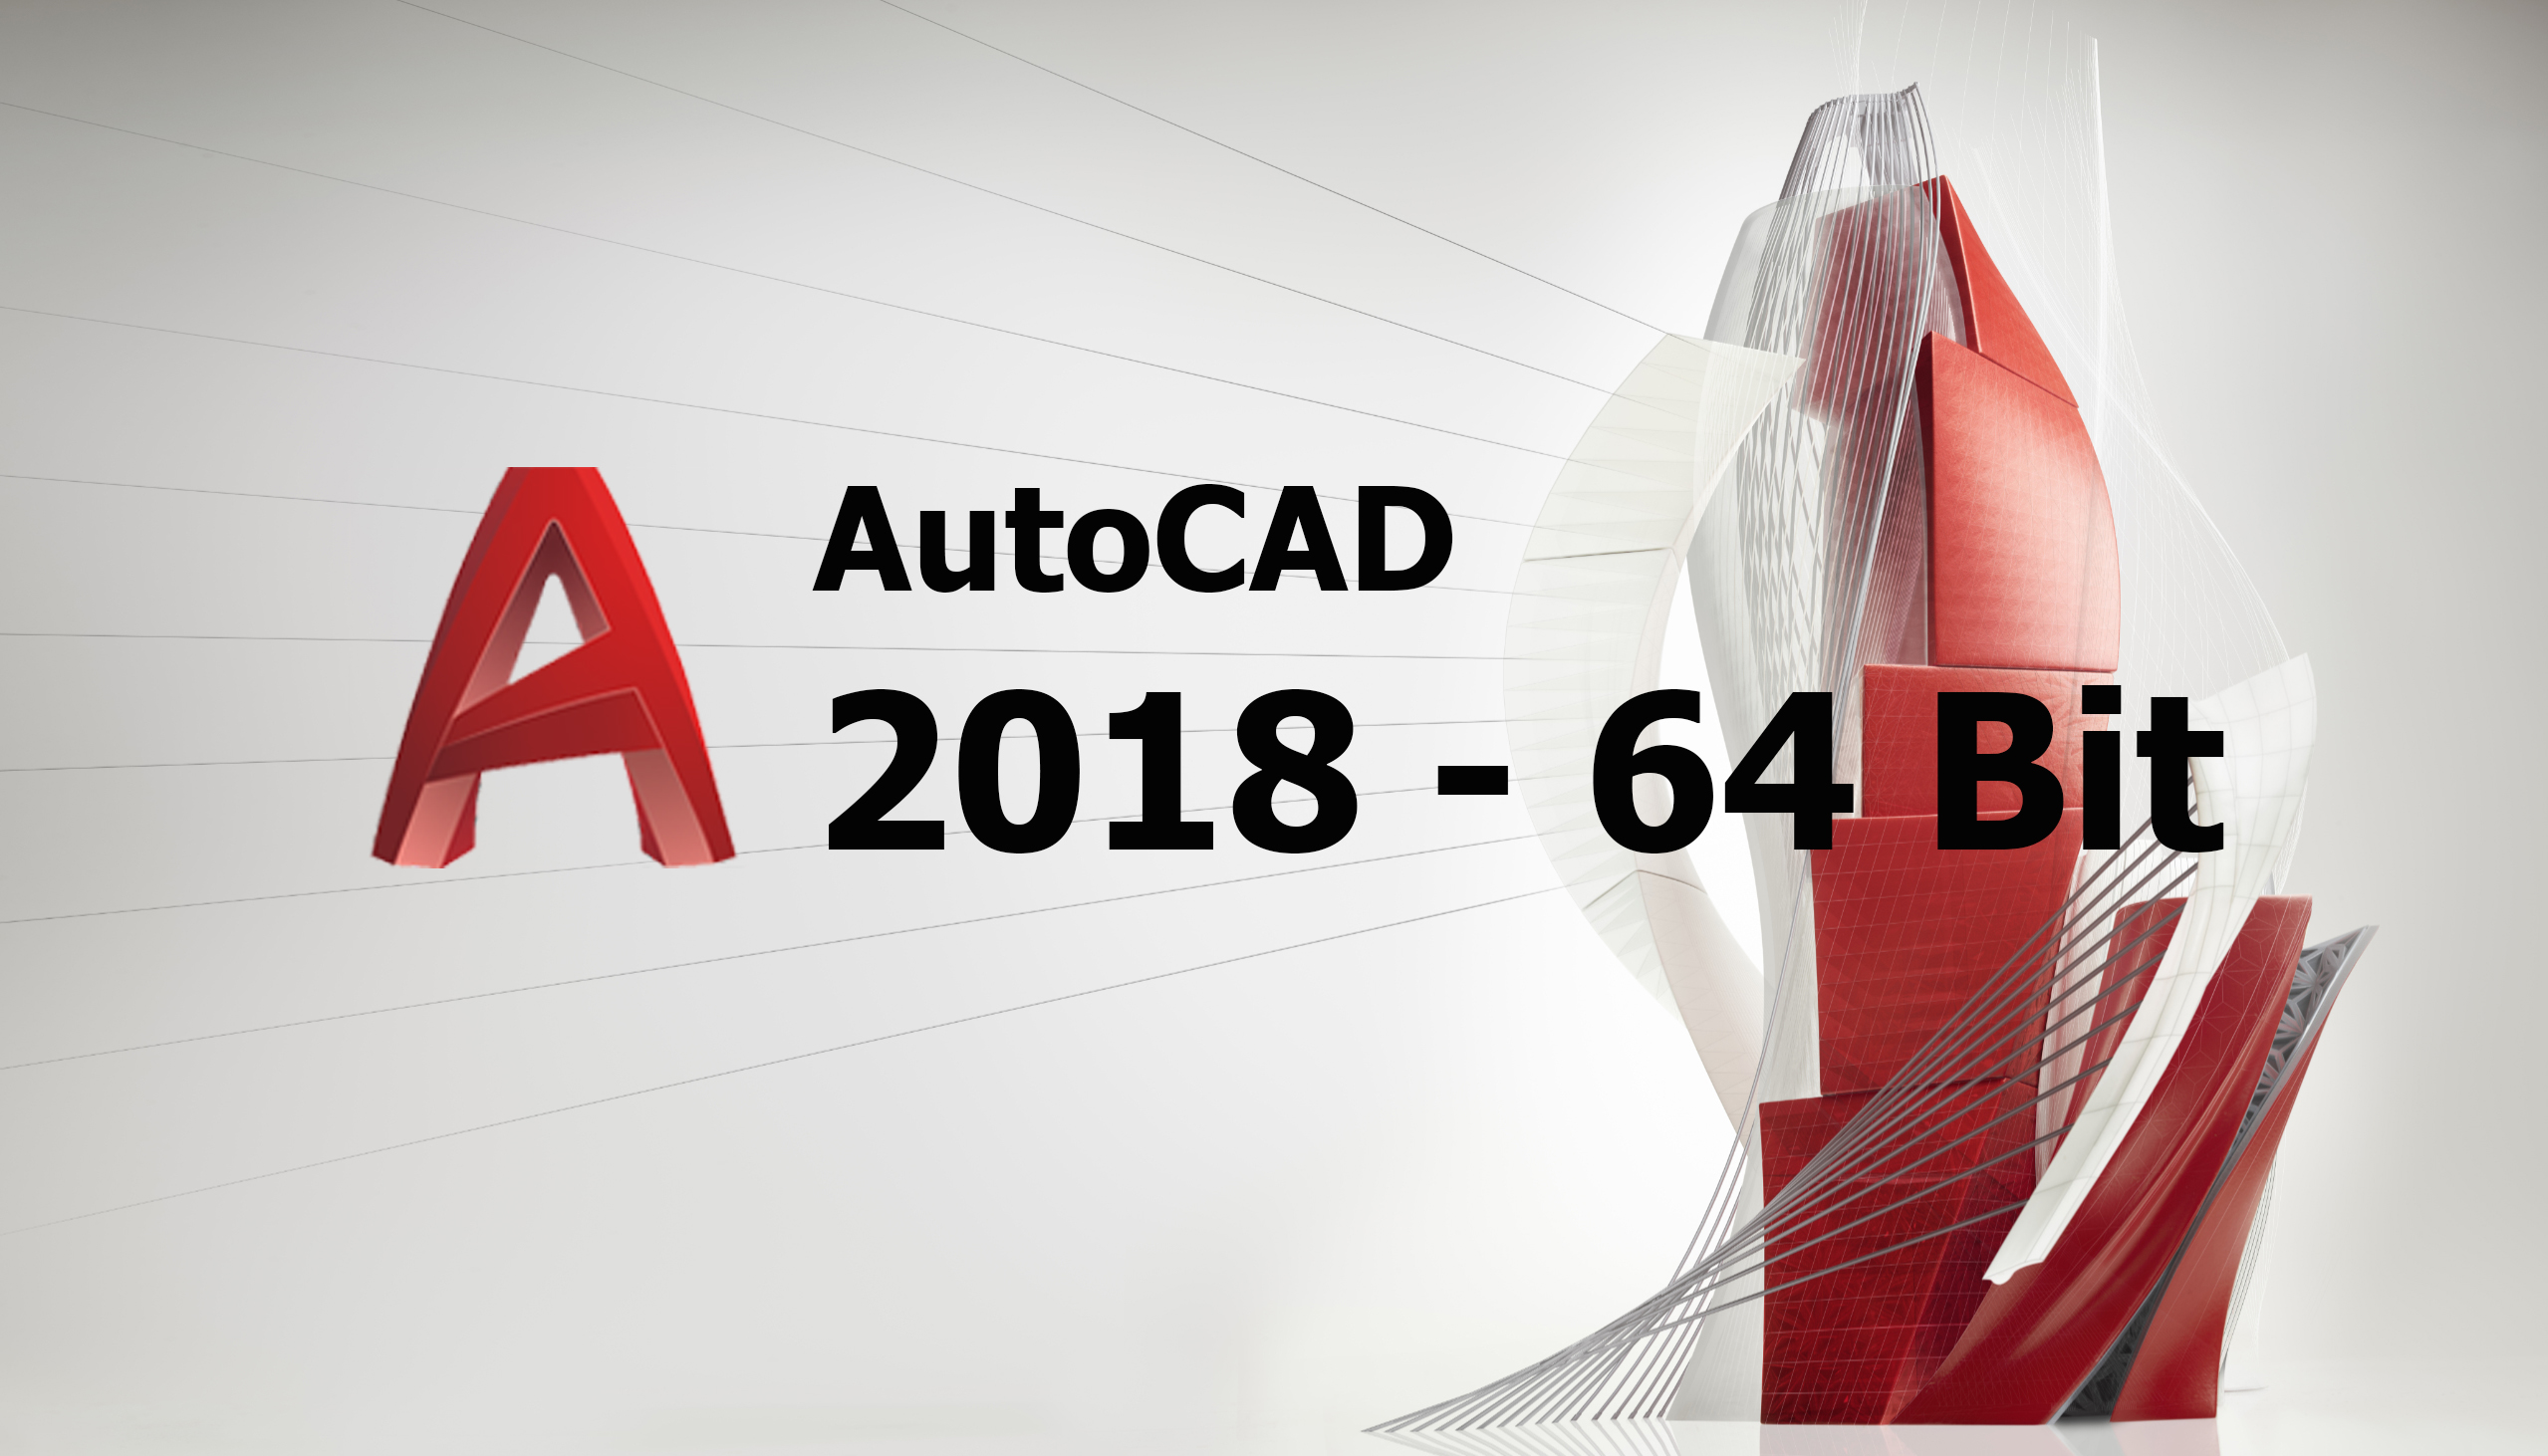 AUTOCAD 2018 – R64